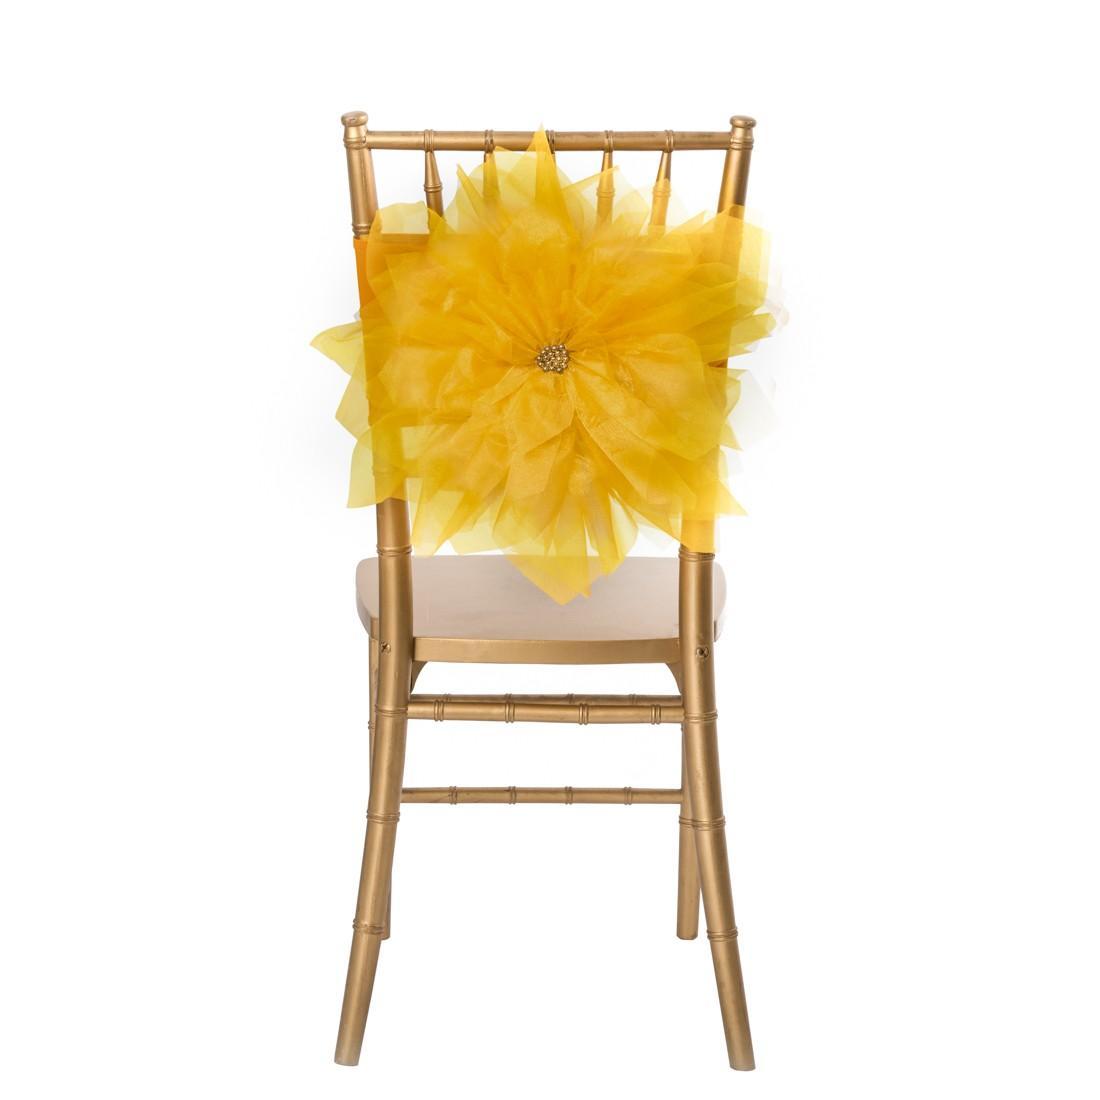 wedding chair sash accessories aqua adirondack chairs plastic 2017 2015 vintage for weddings 3d flower pearl